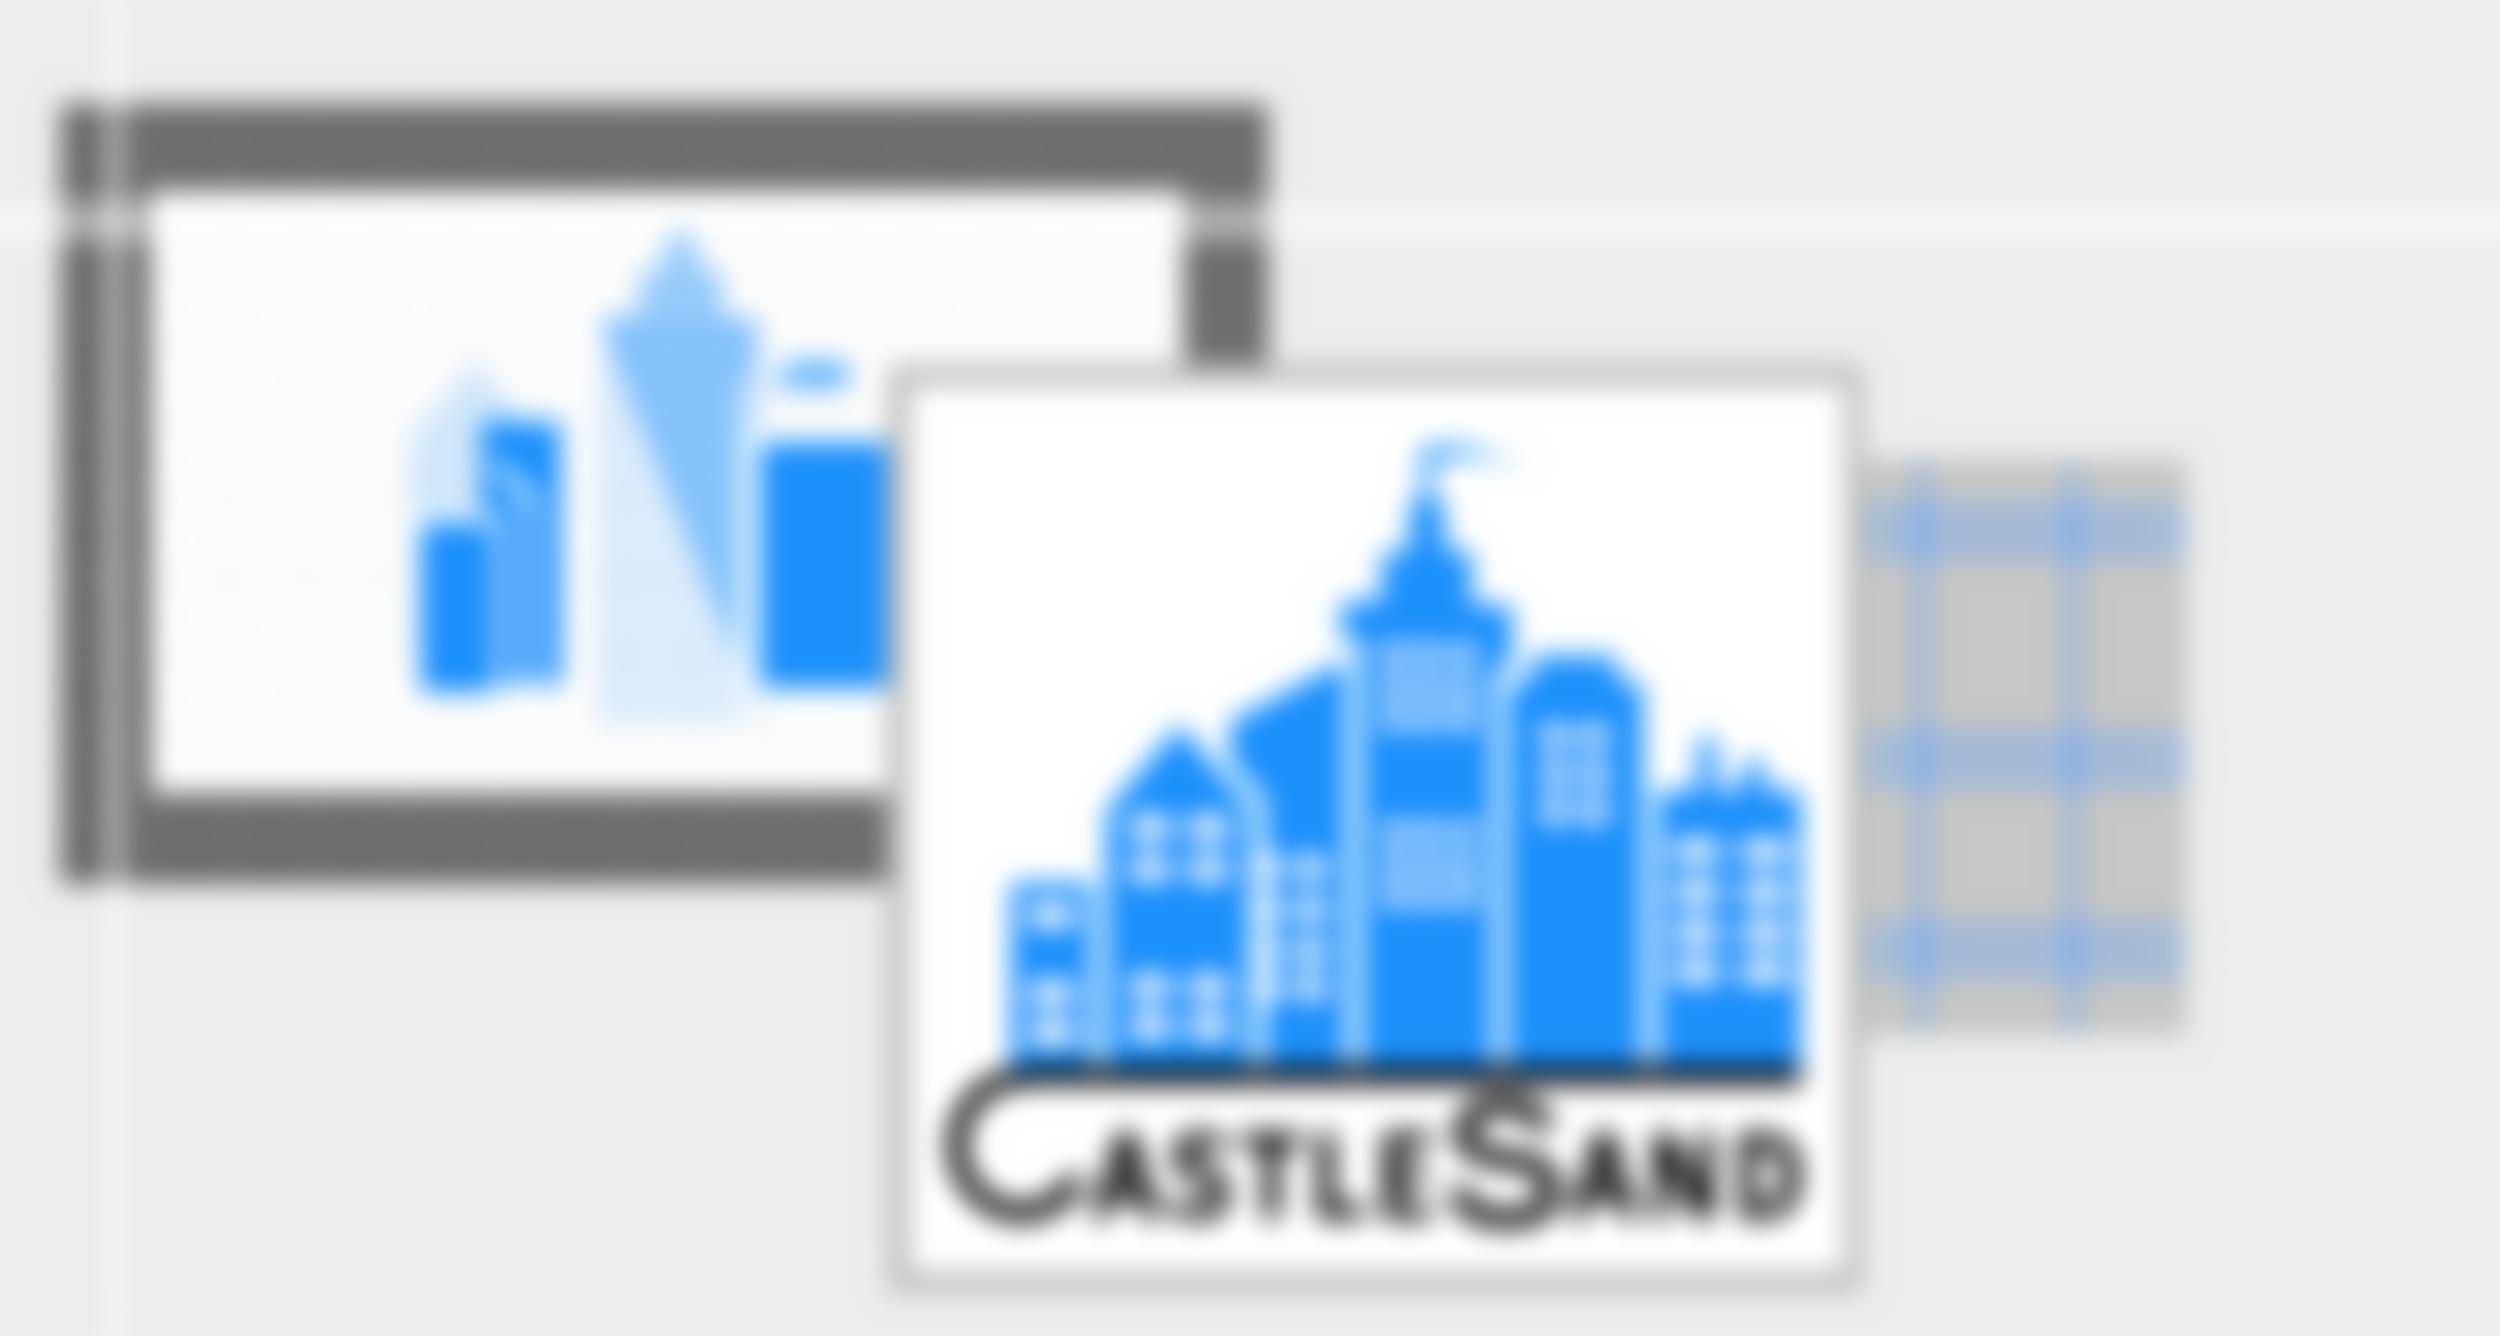 Castlesand